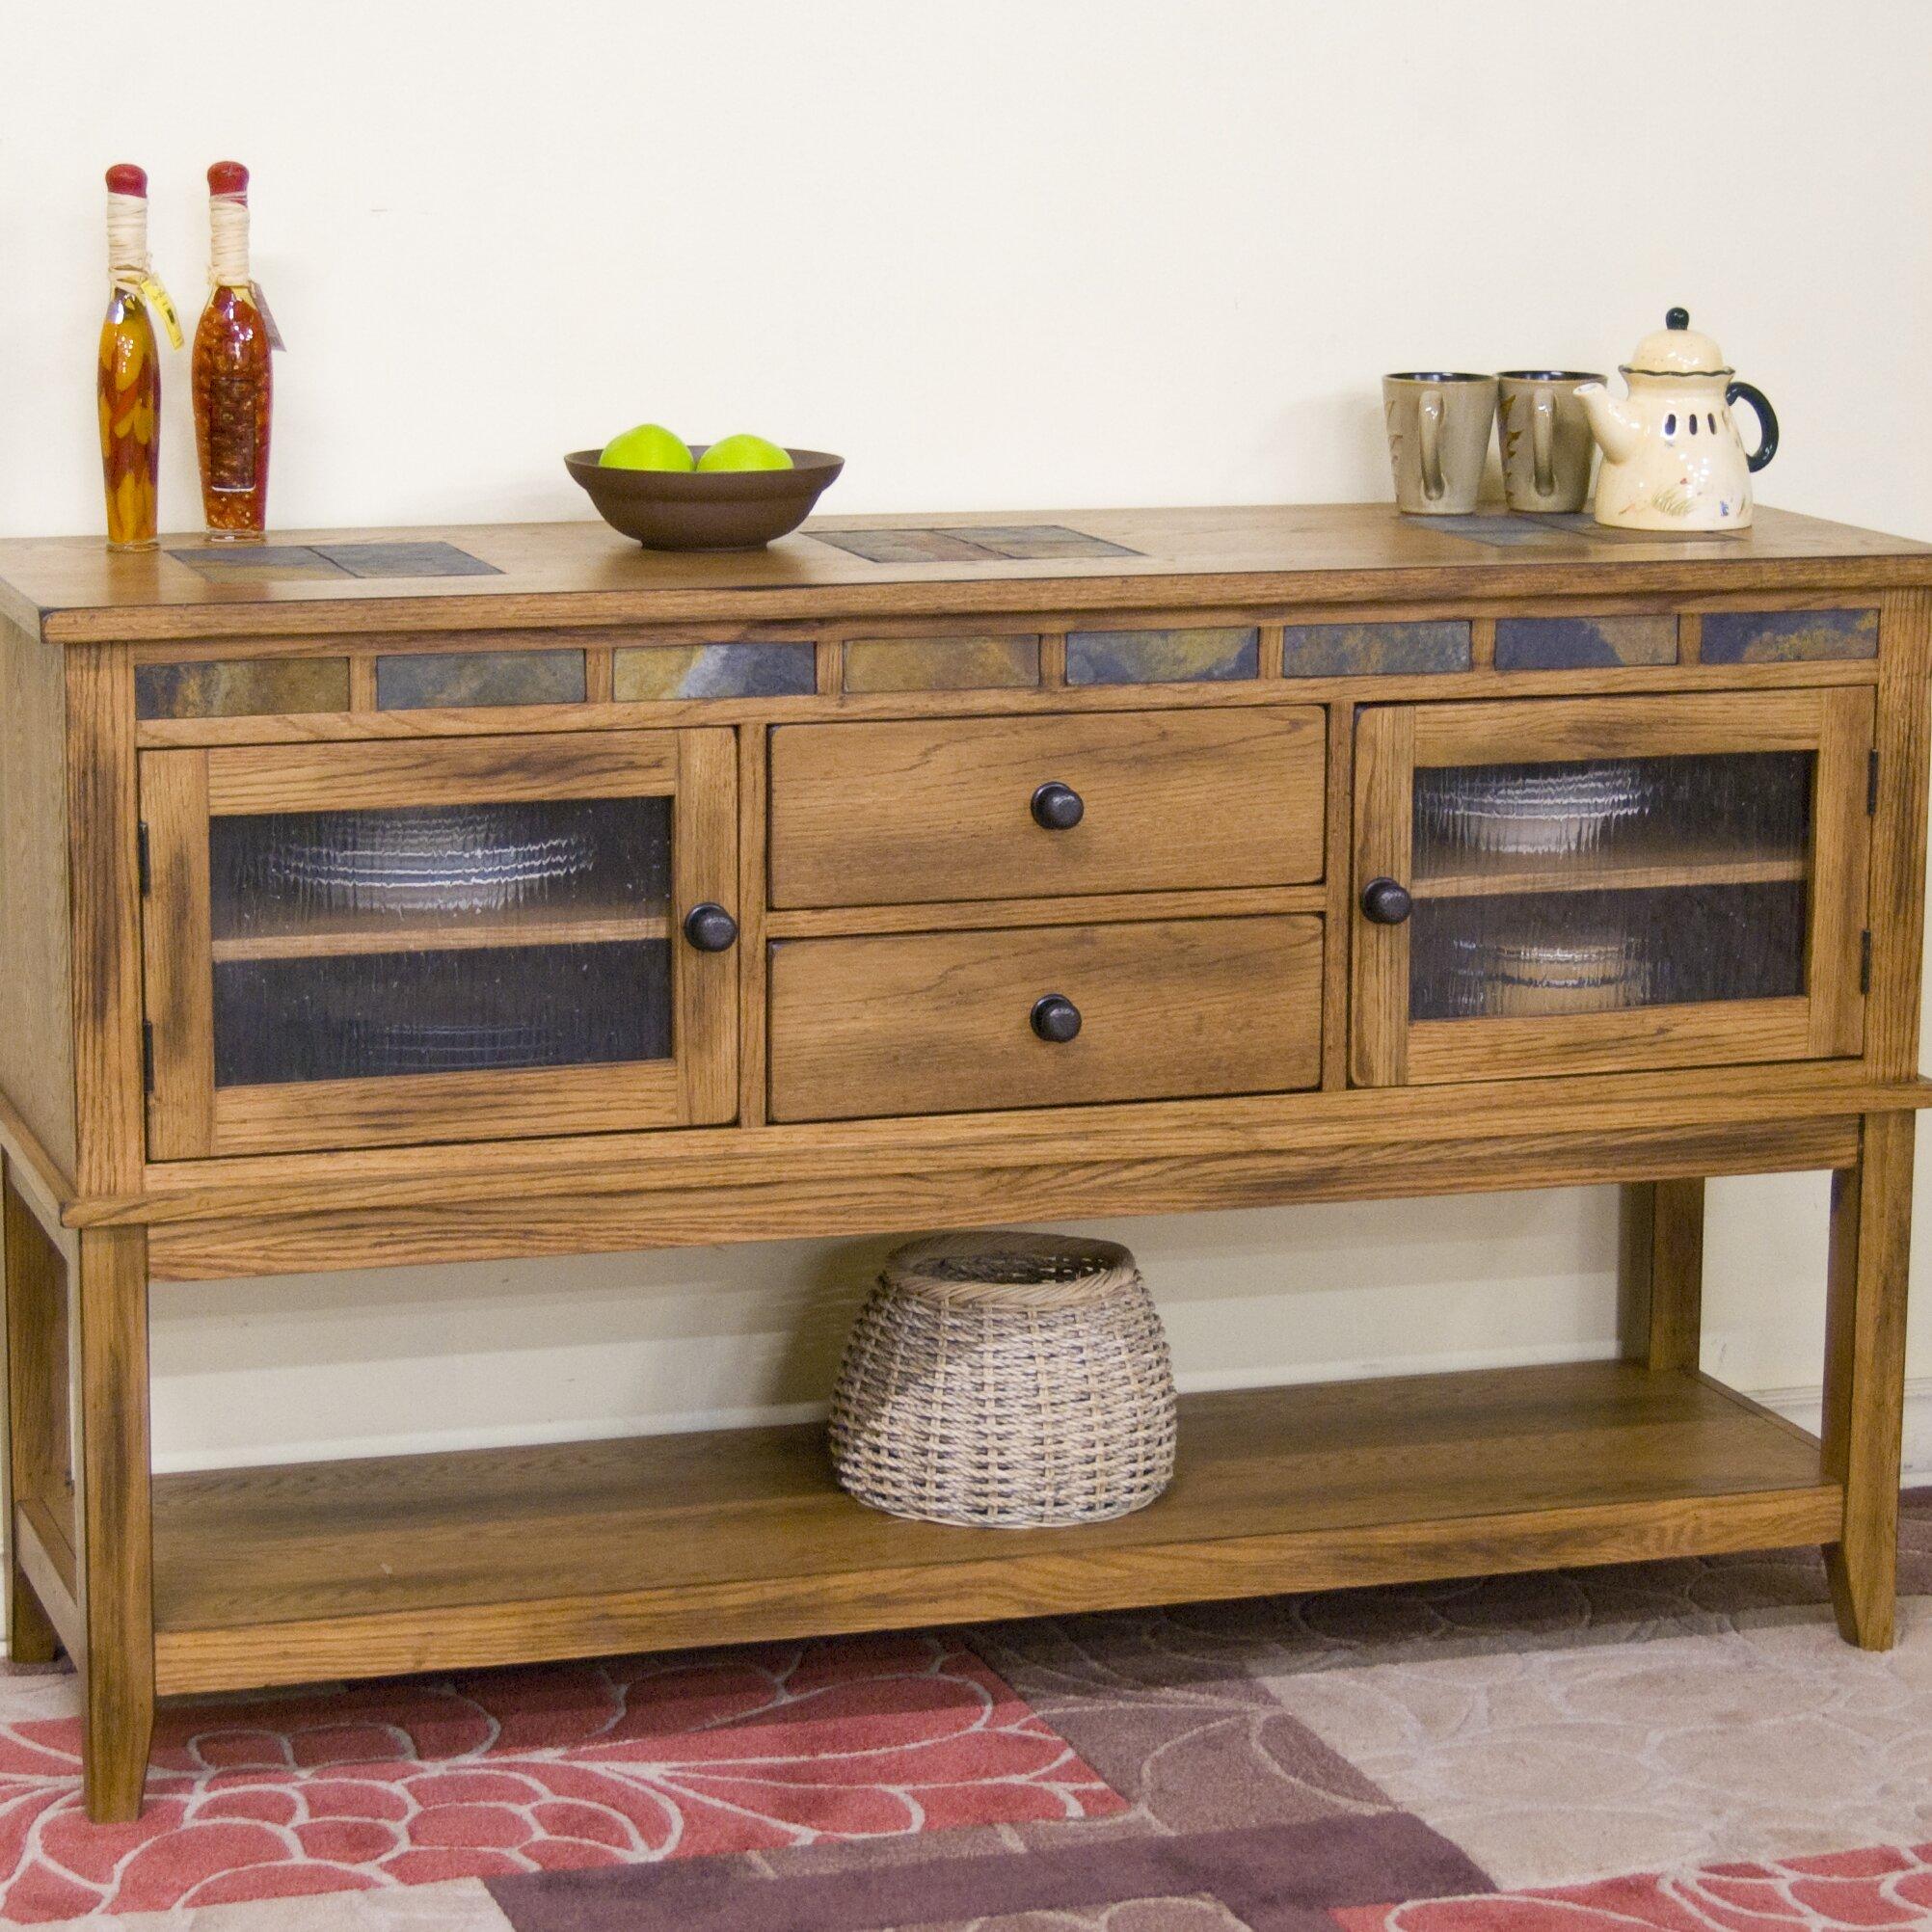 Sunny Designs Bedroom Furniture Santa Fe Petite Chest By Sunny Designs Hearingp7de